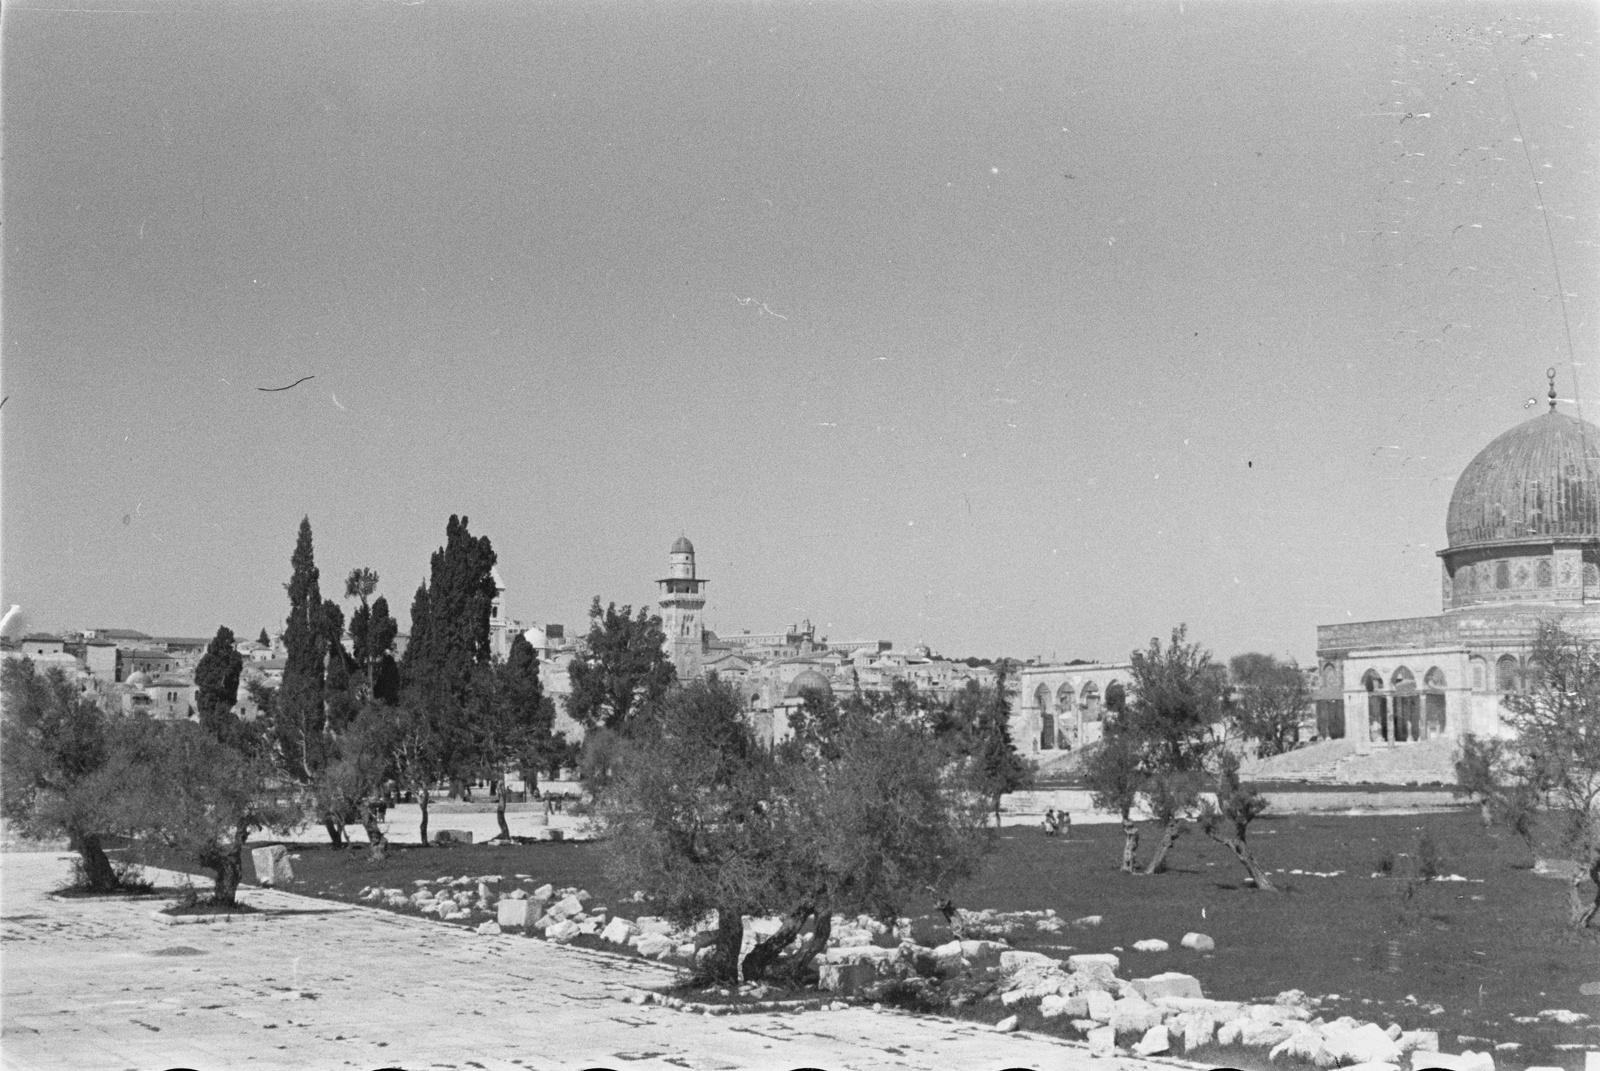 Вид на Иерусалим. Справа - купол Купола Скалы